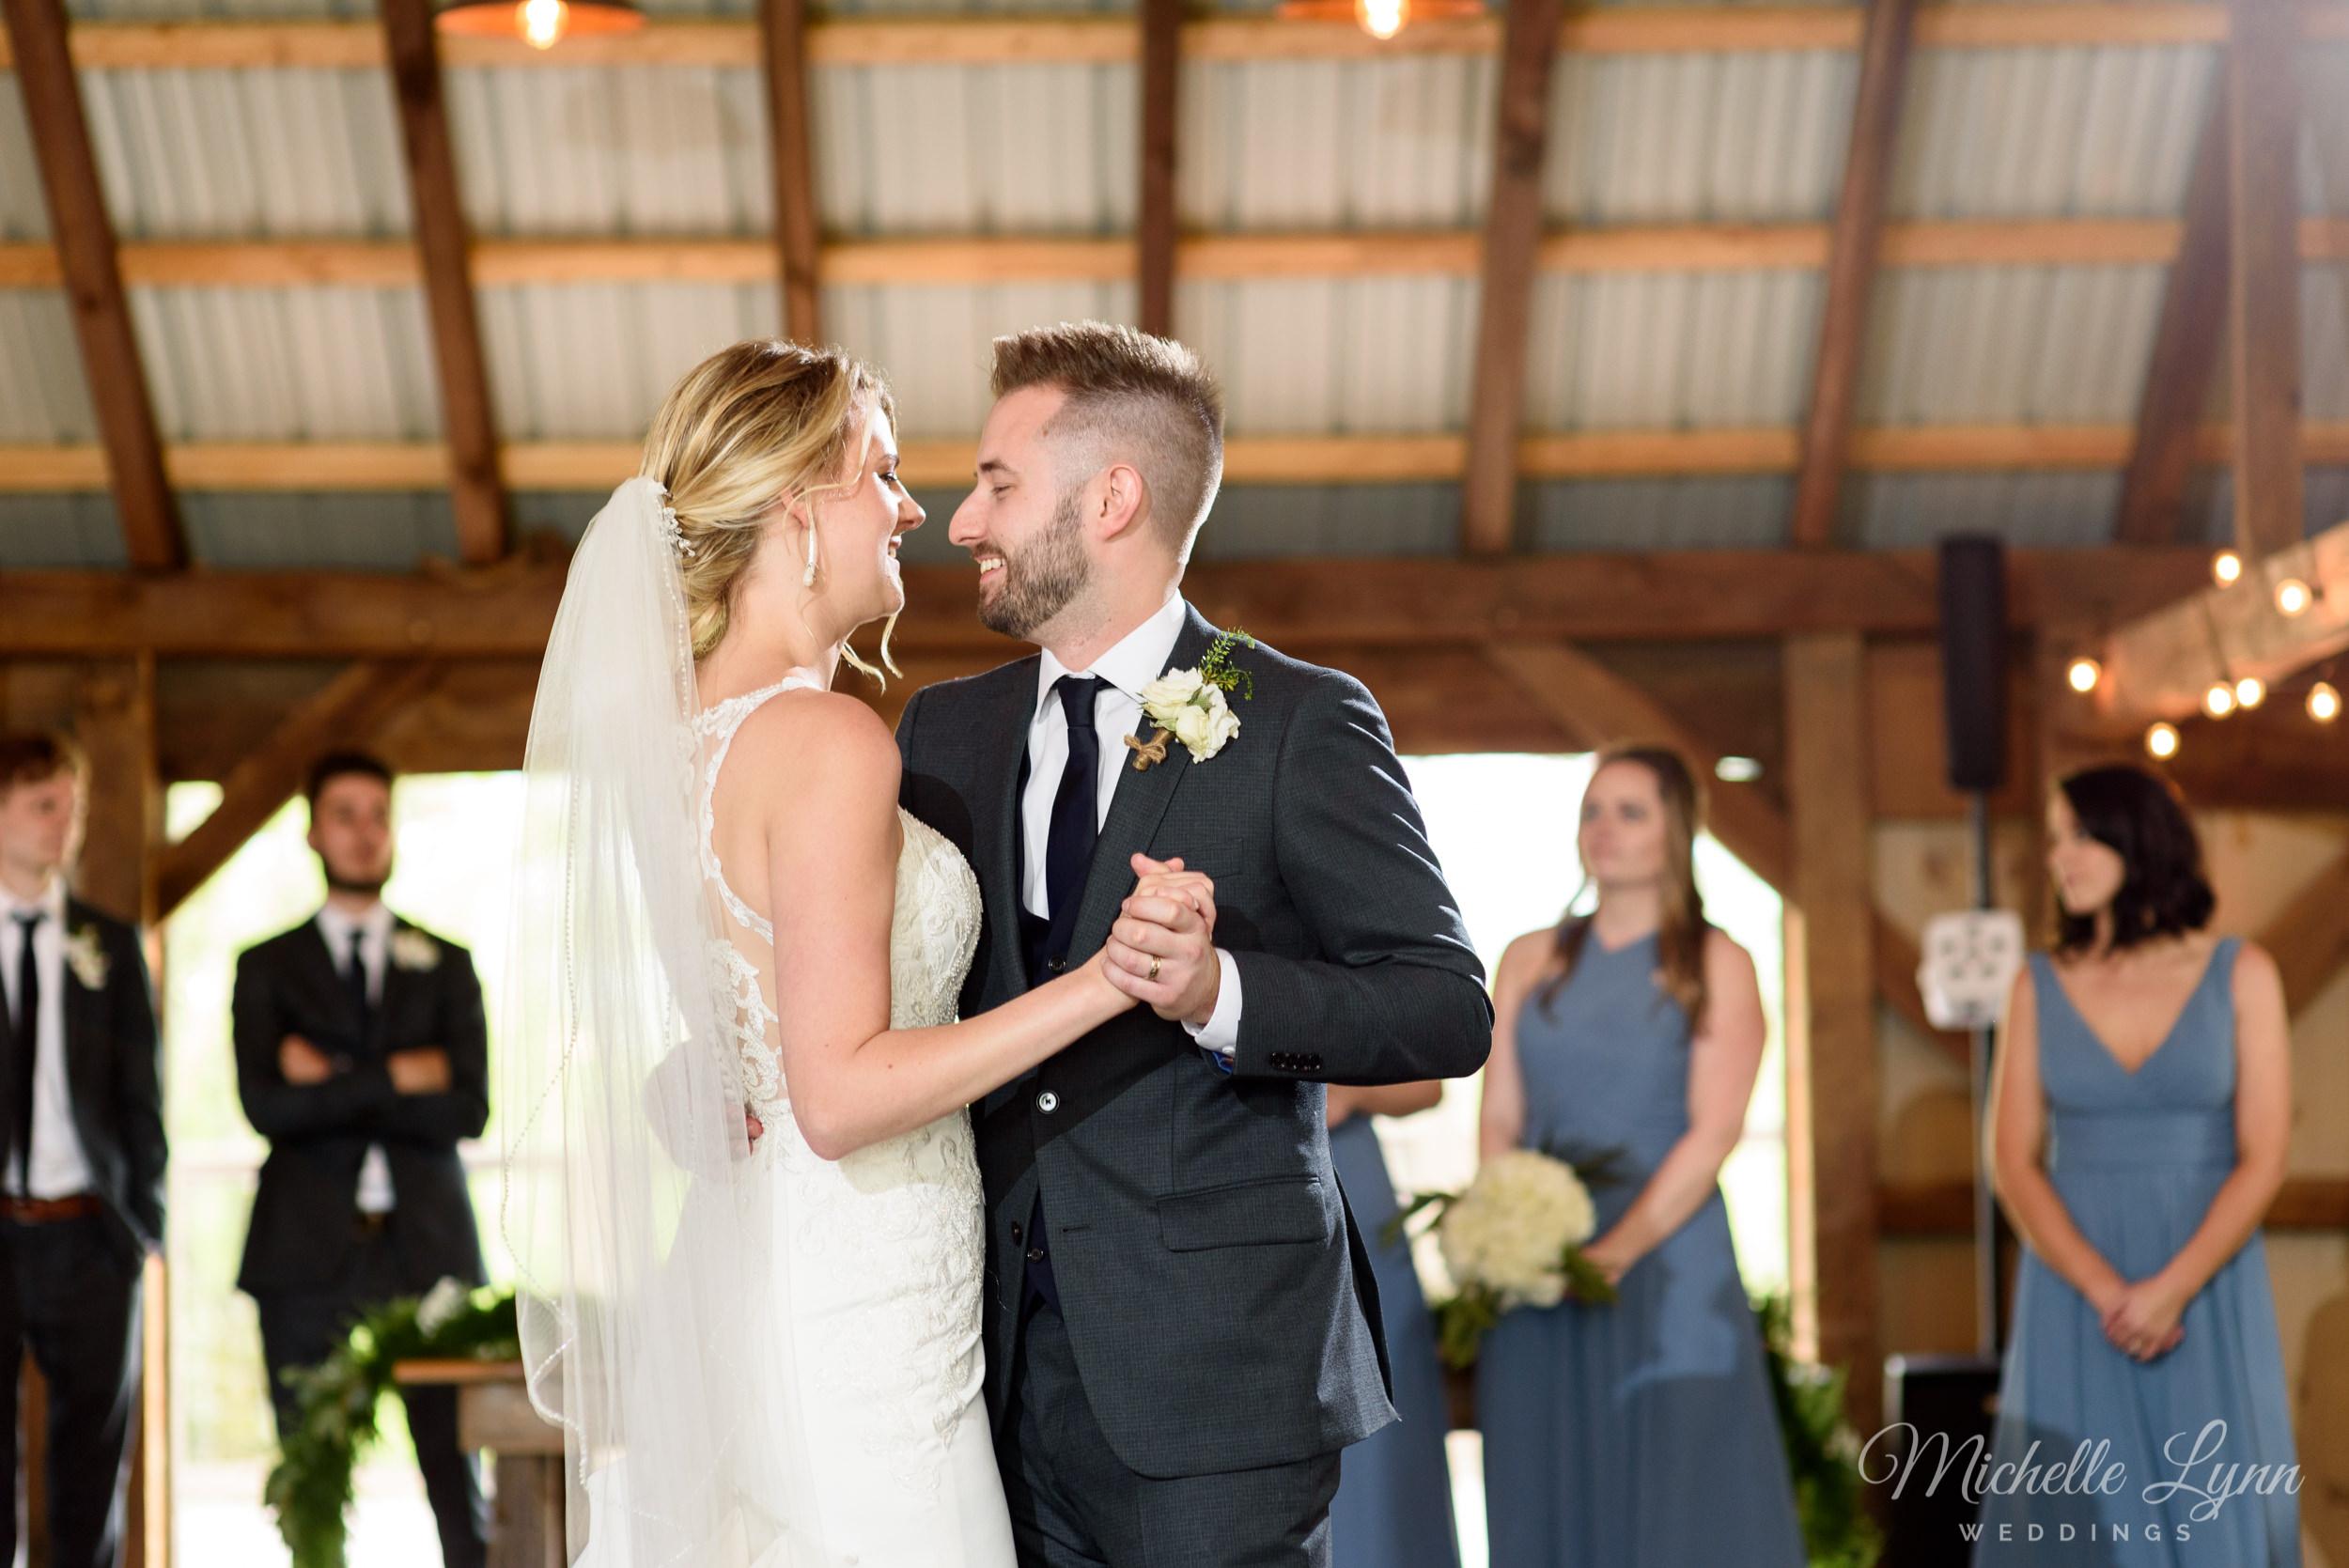 mlw-the-farm-bakery-and-events-wedding-photos-61.jpg